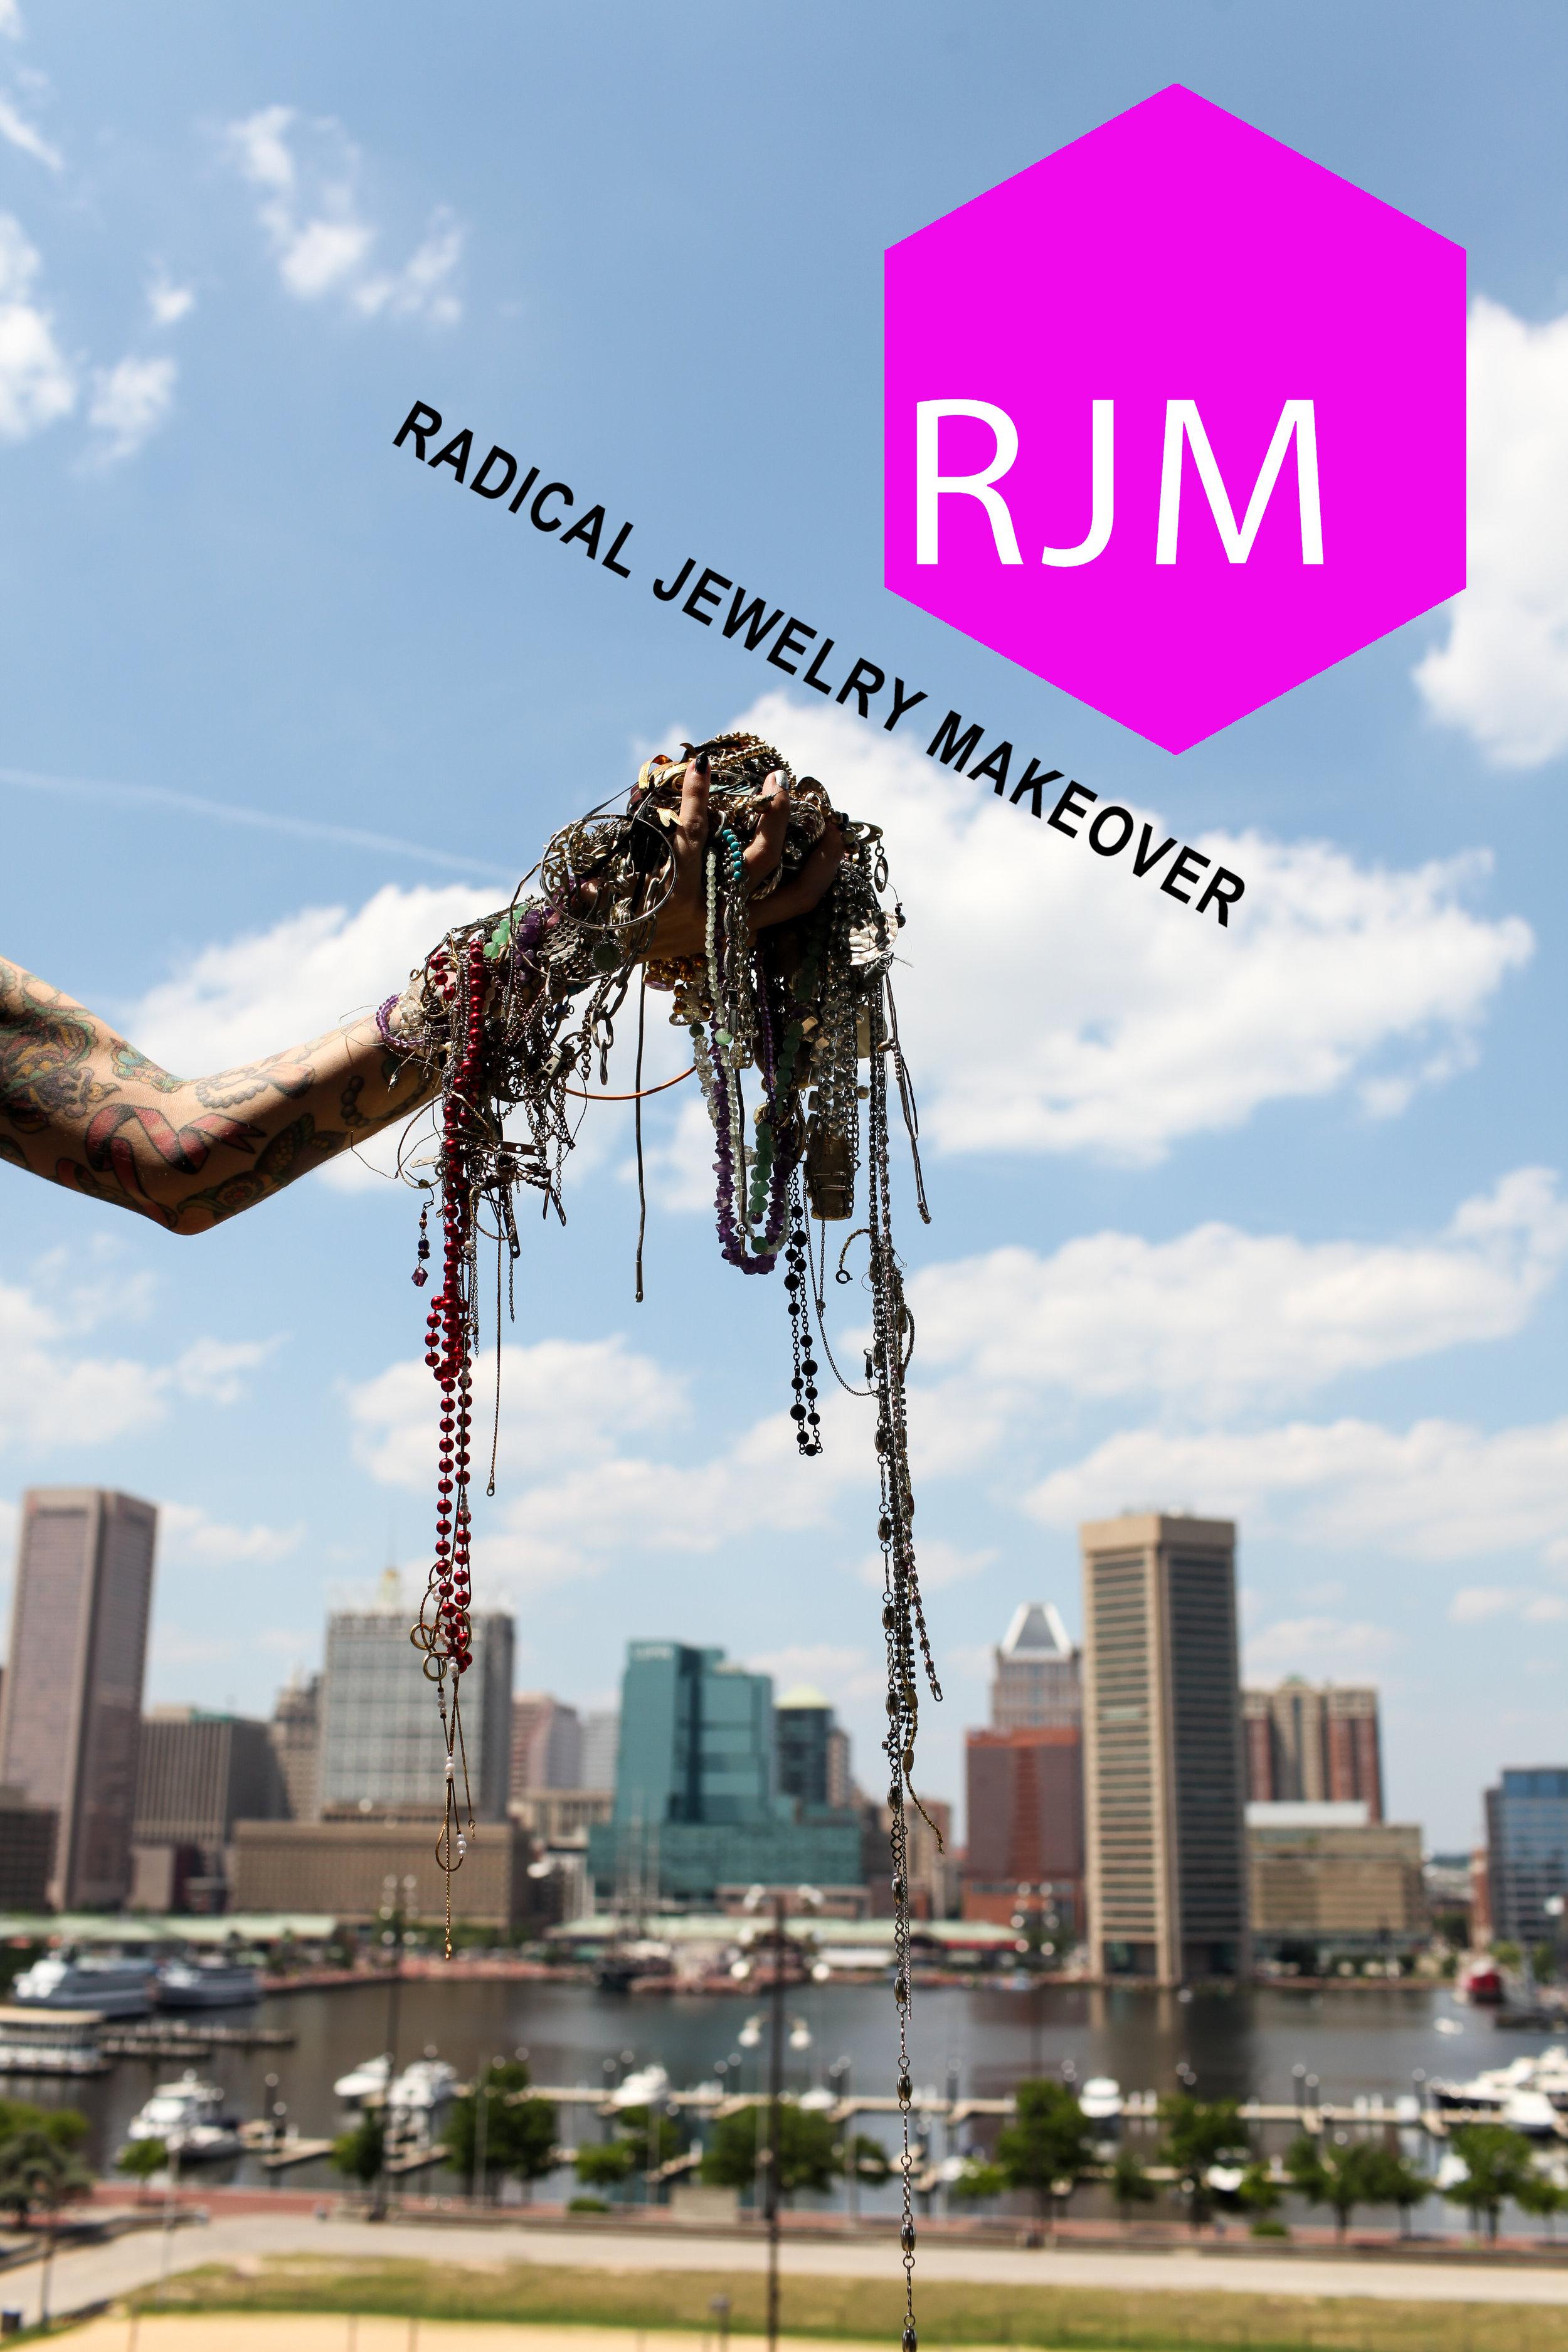 RJM_press image copy 2.jpg